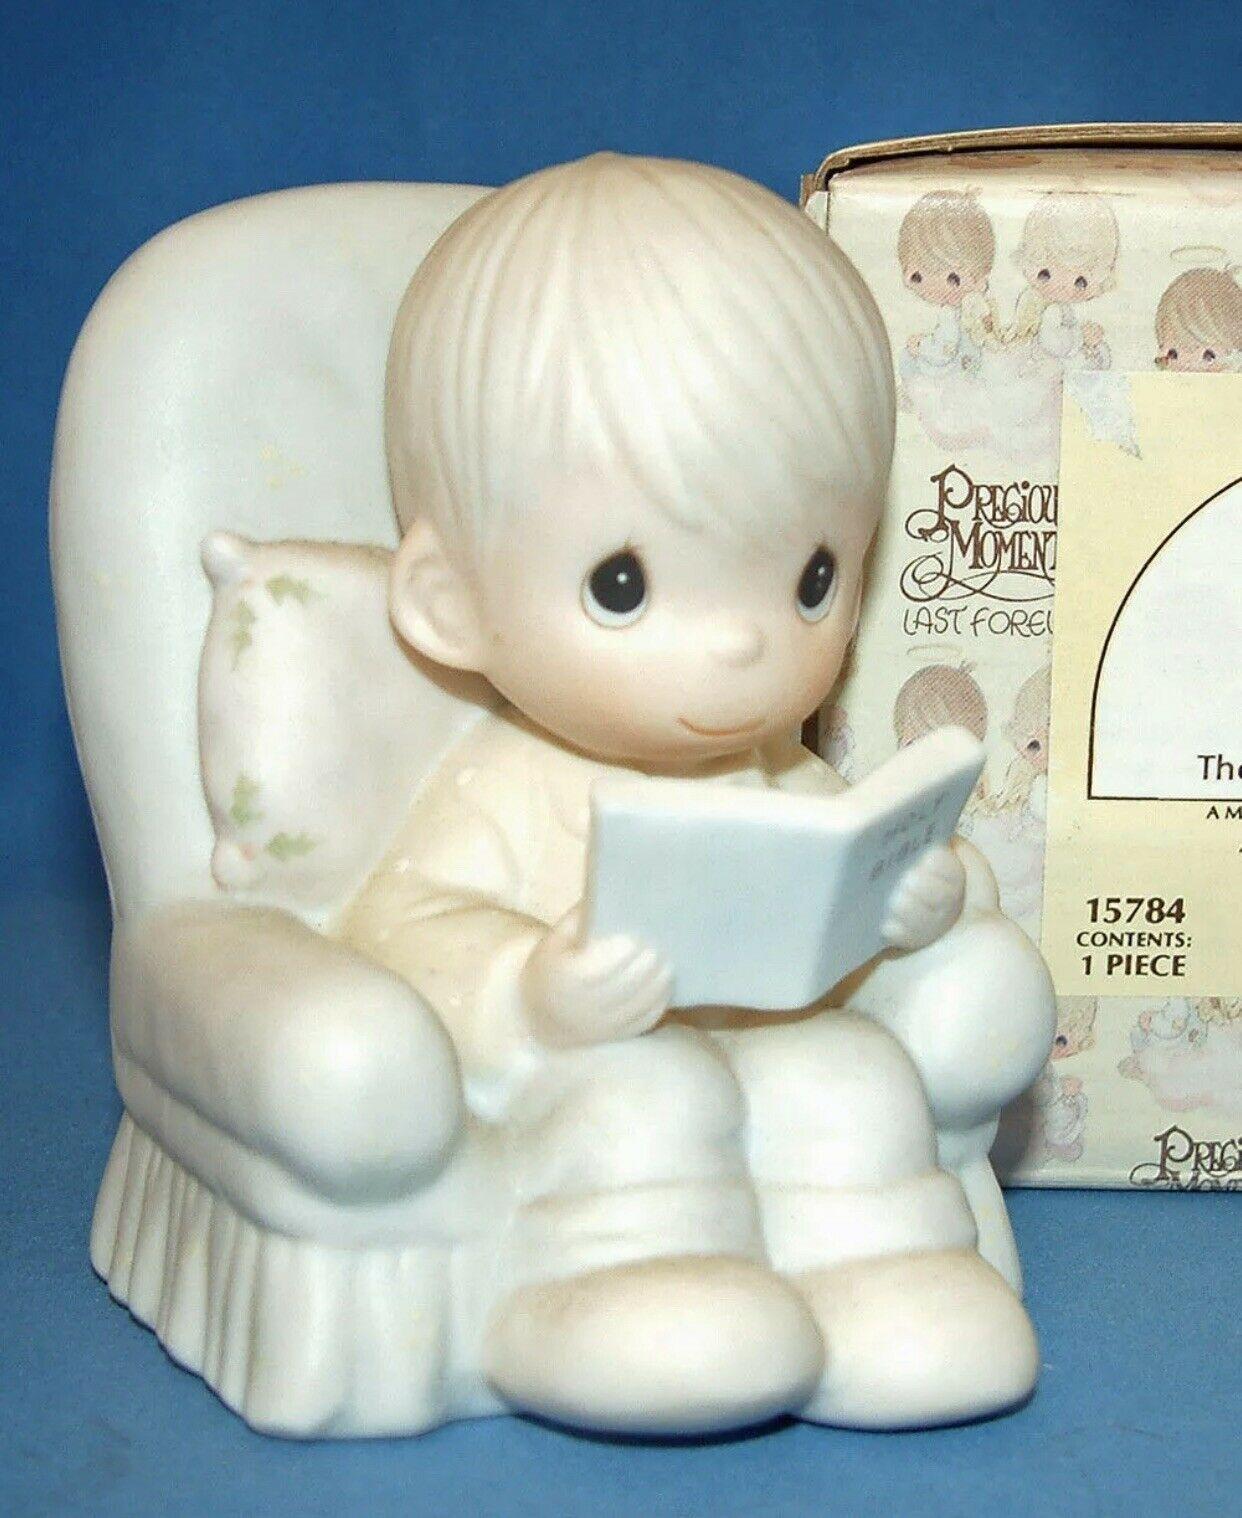 Precious Moments Figurine 015784 ln box The Story of God's Love